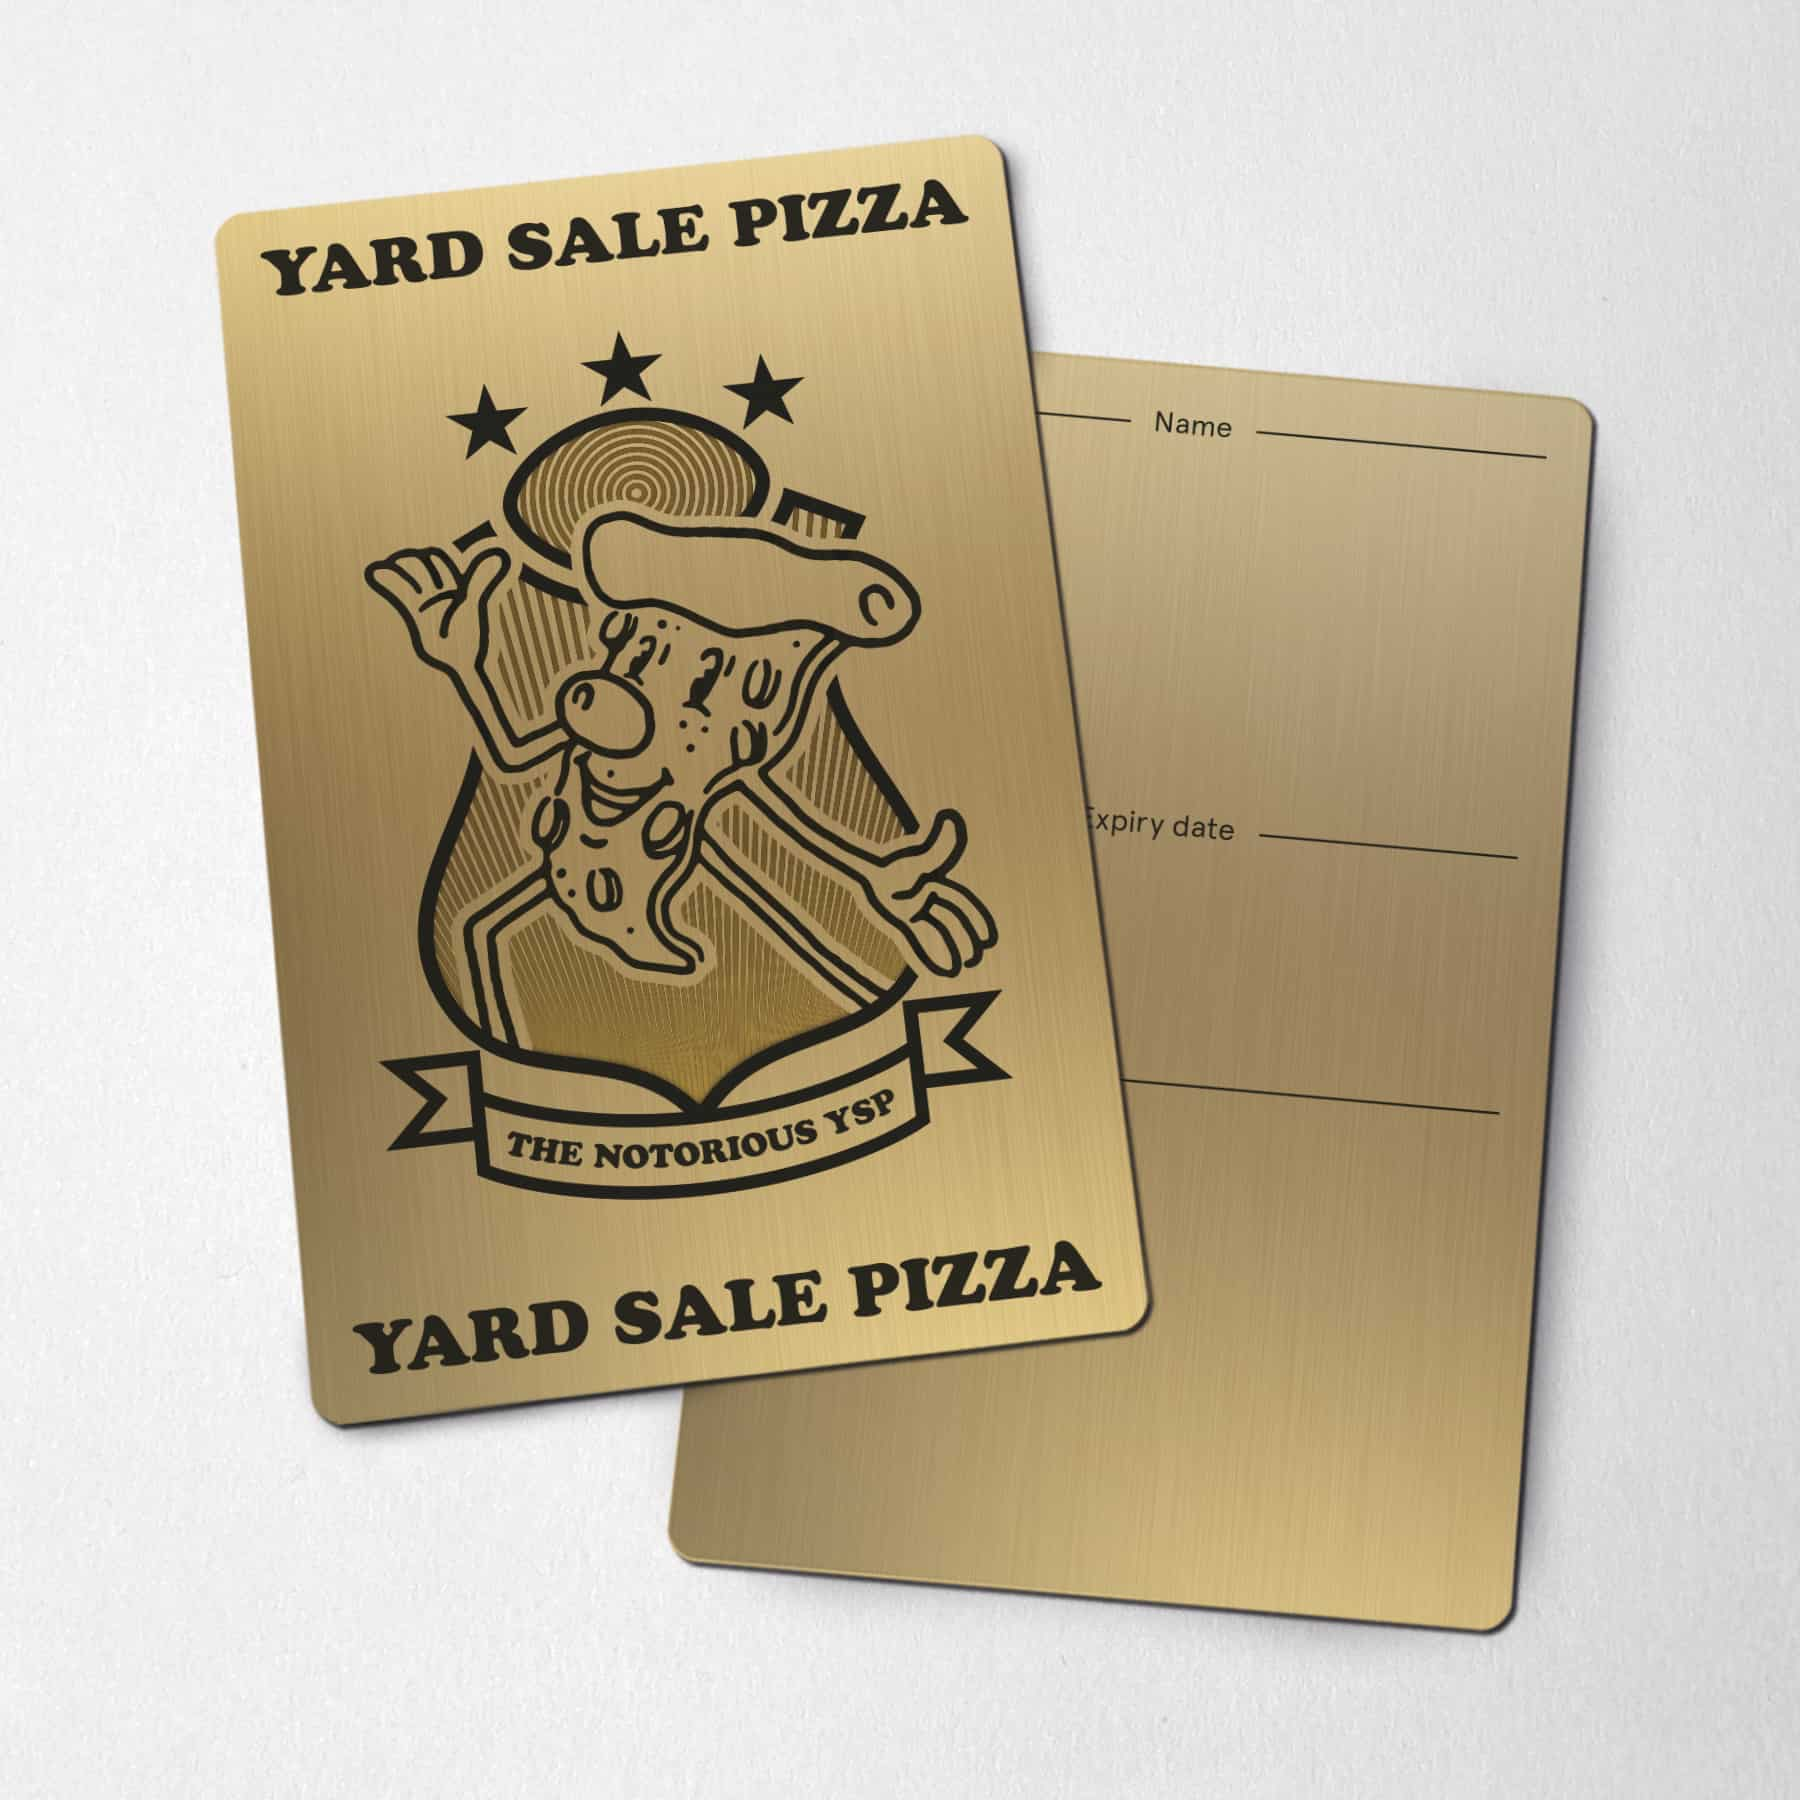 Yard Sale Pizza YSP Card